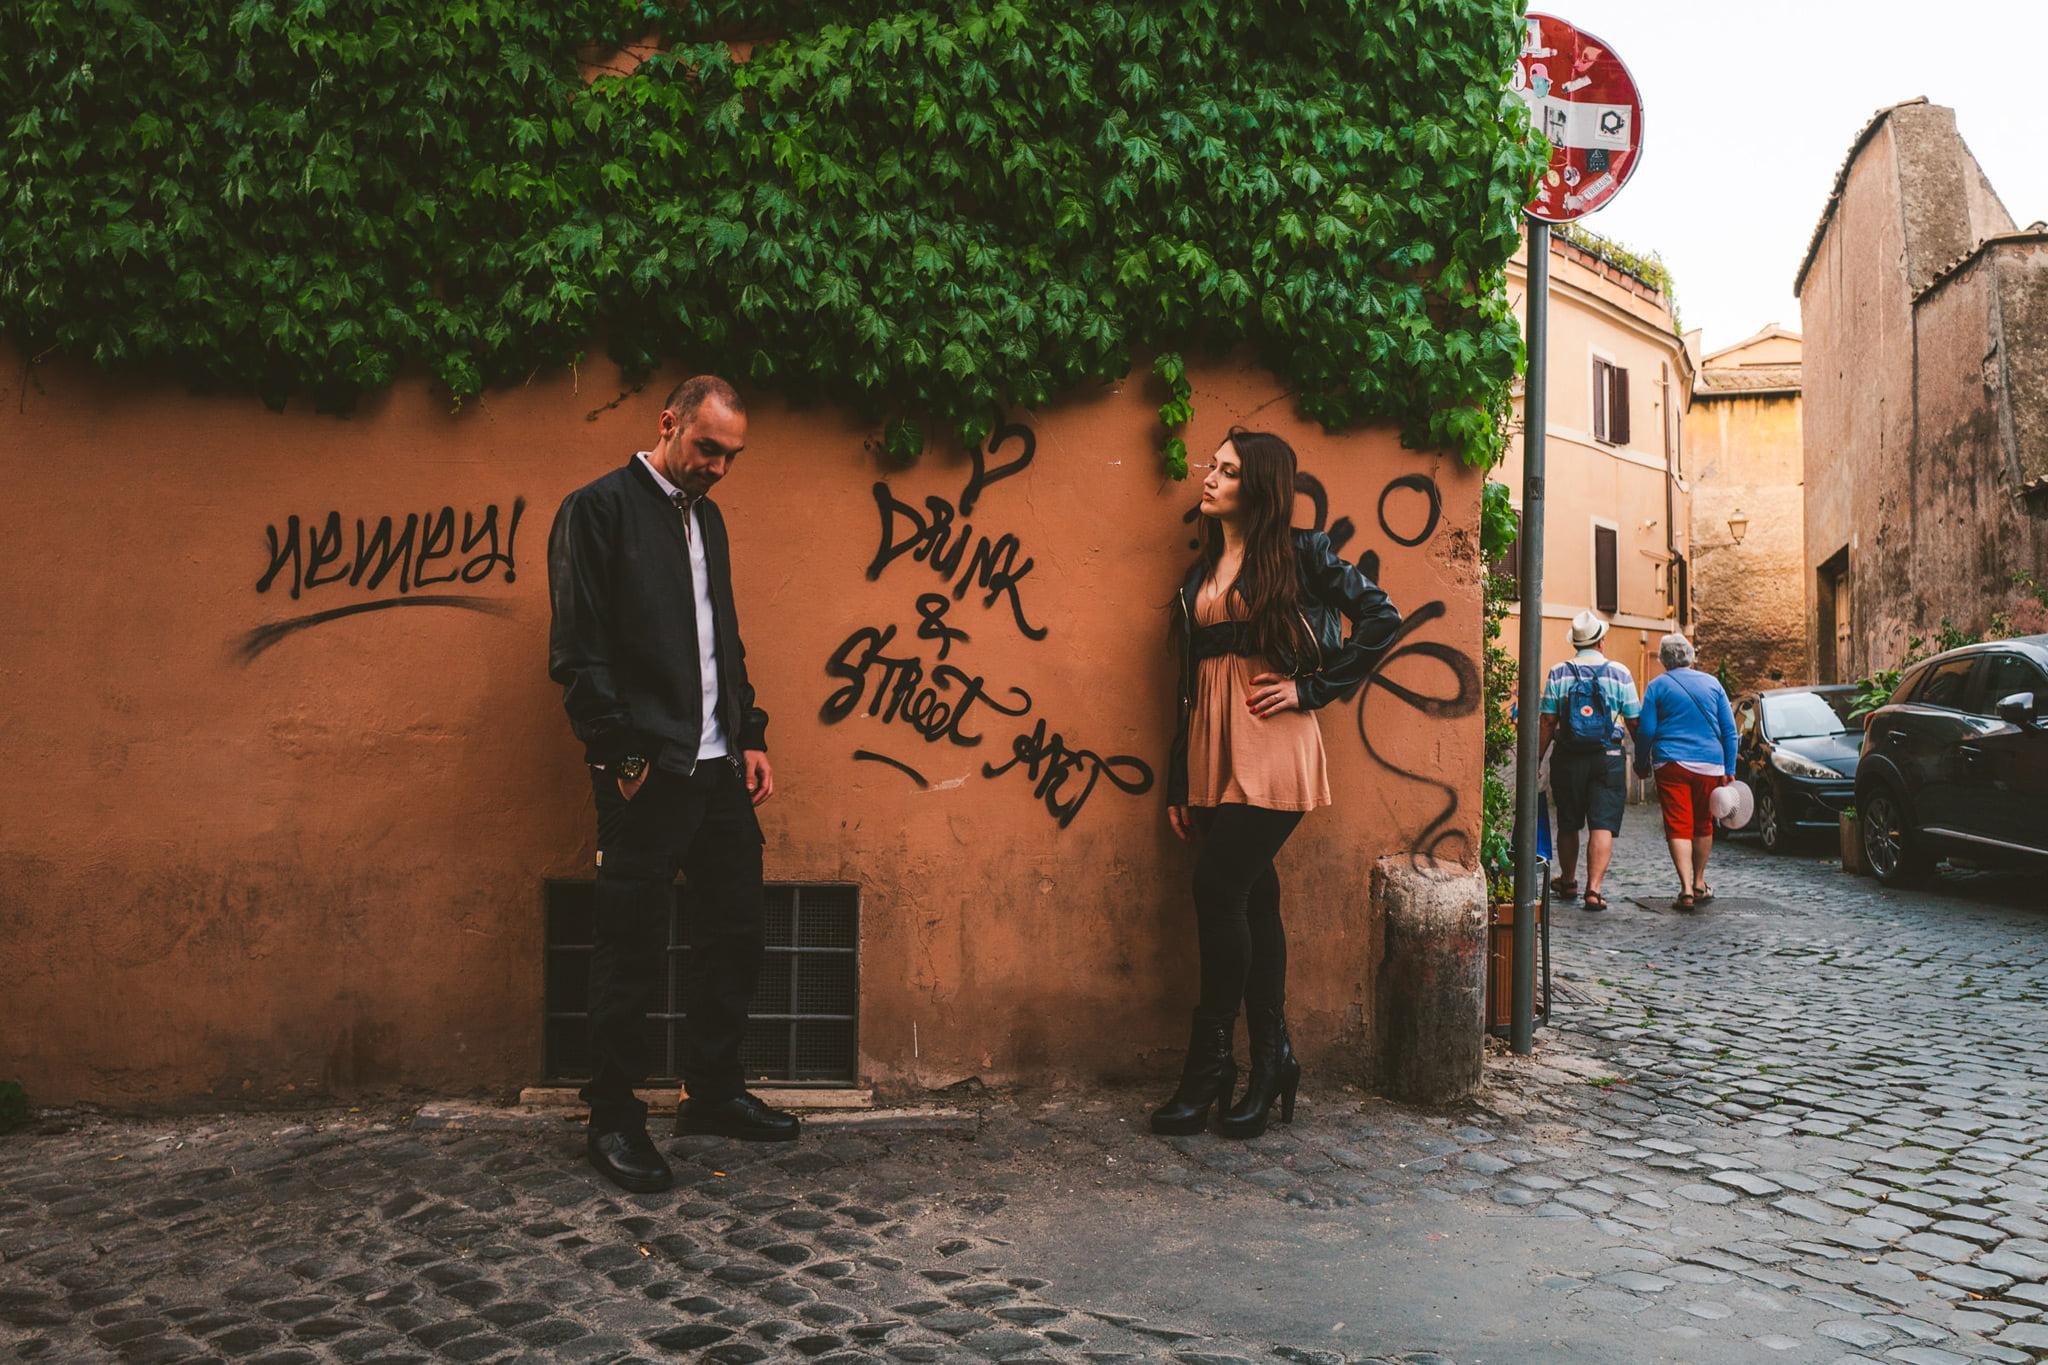 Prewedding Photography in Rome, Prewedding Photography in Rome, Trastevere by Federico Pannacci, Federico Pannacci, Federico Pannacci